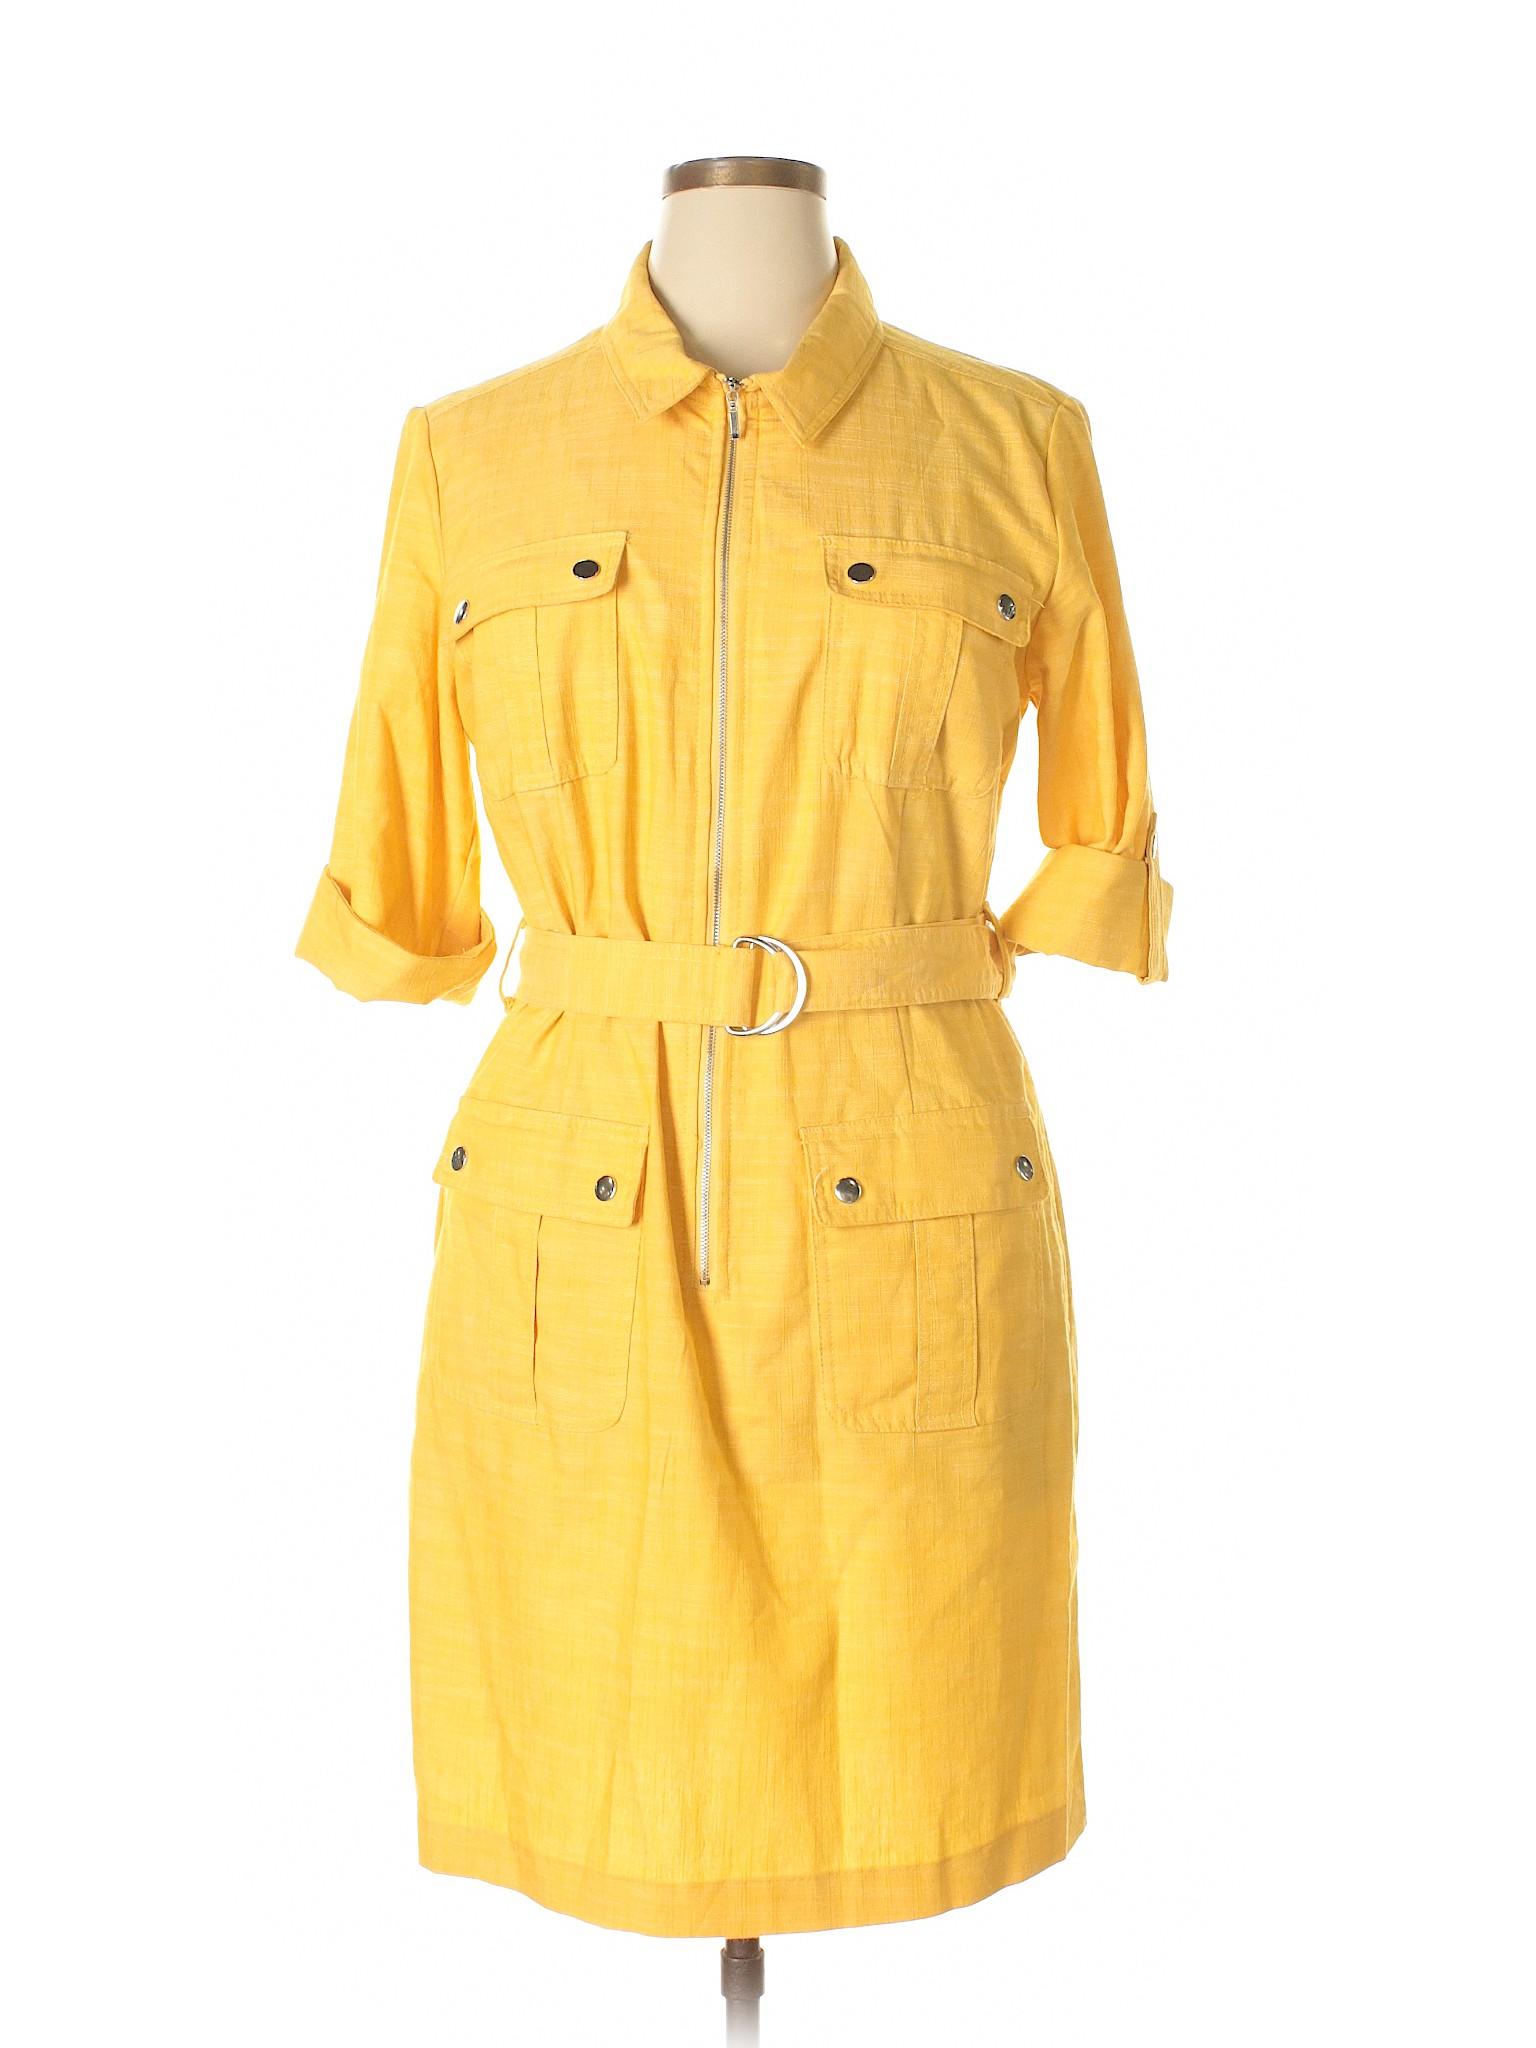 Sharagano Dress Selling Casual Selling Casual Dress Sharagano Selling wXqUgdHgB